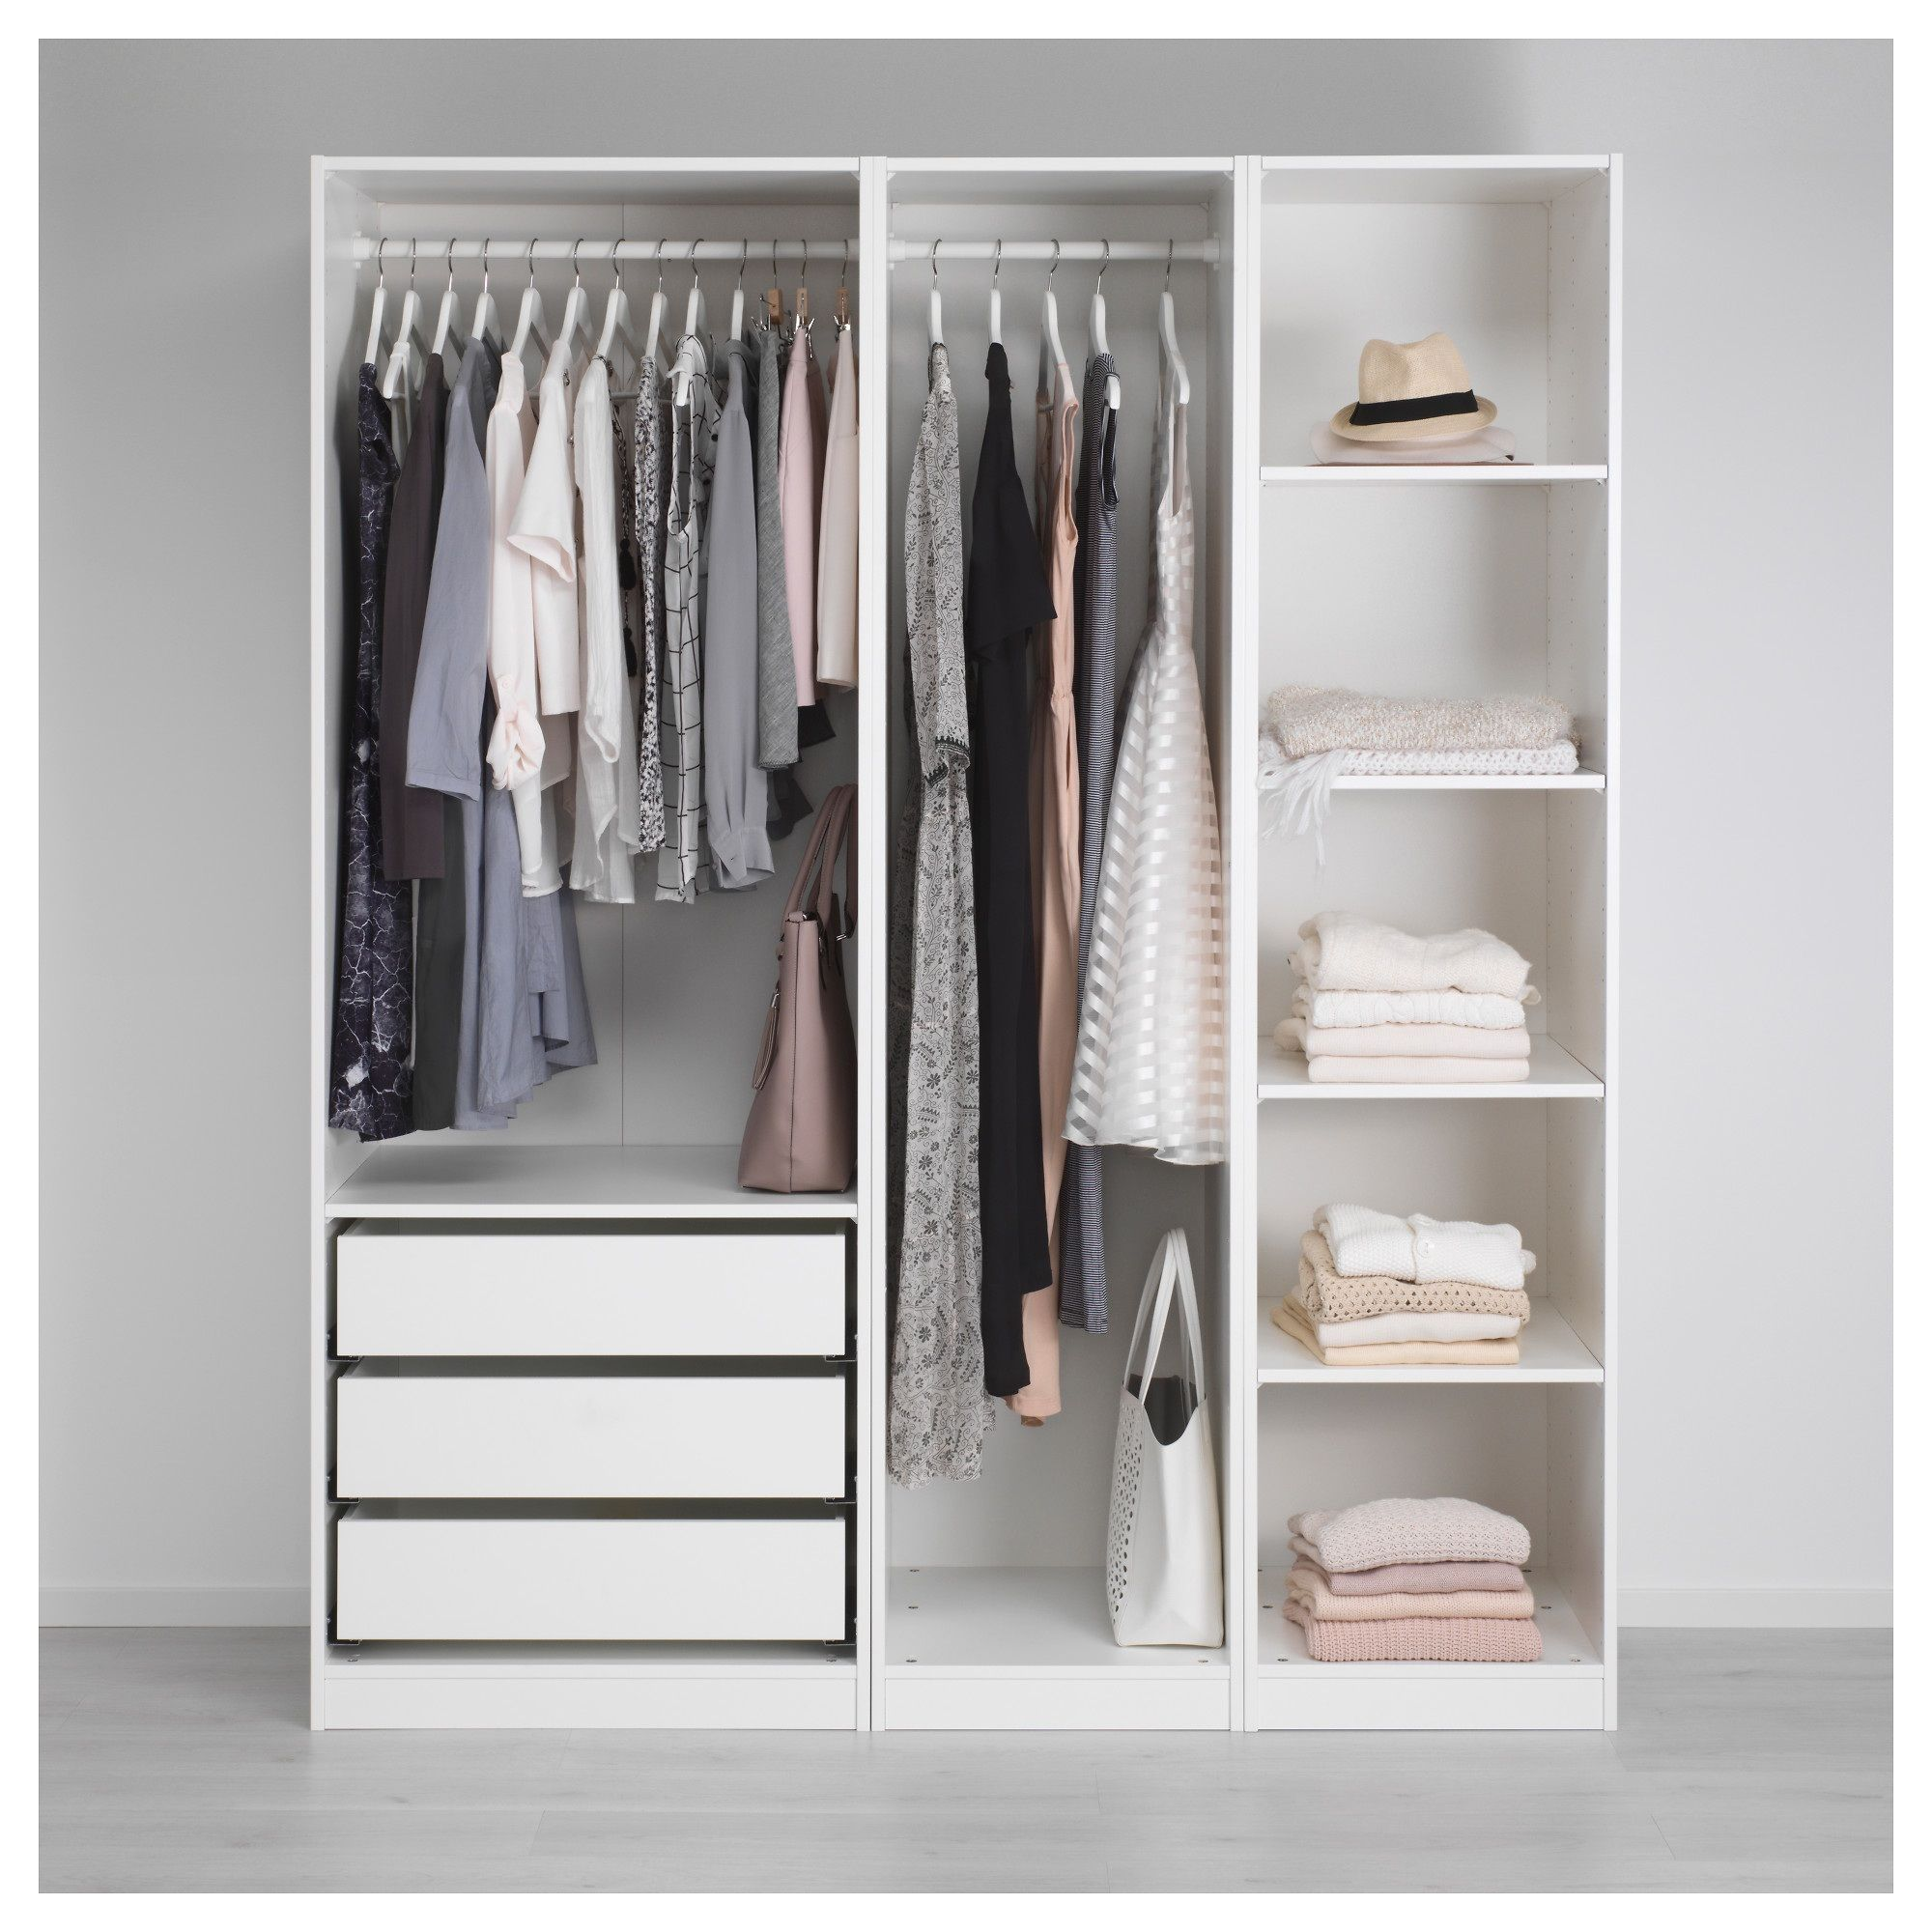 Astonishing Ikea Pax System Closet Designs Bedroom Cupboards